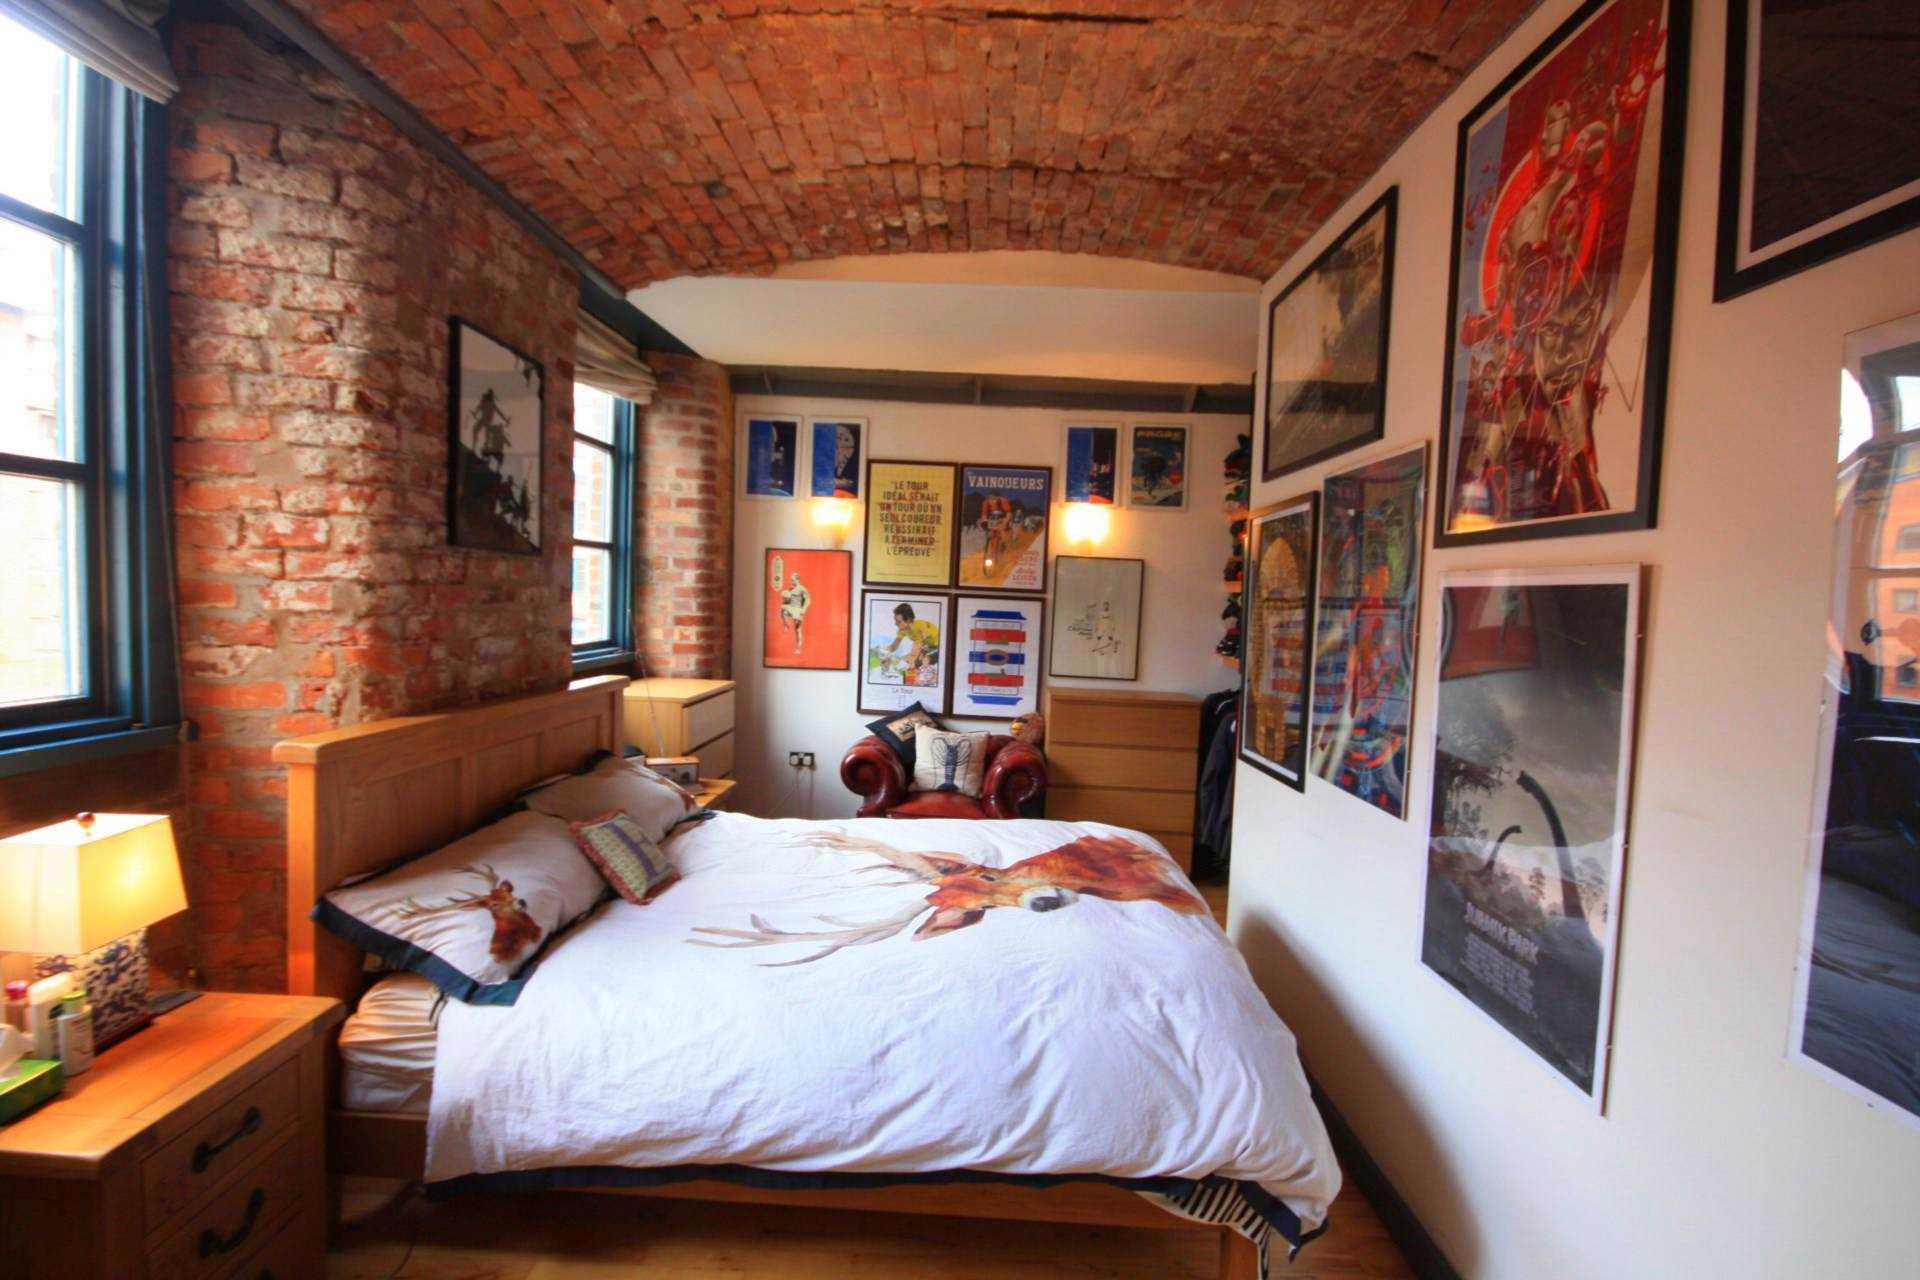 1 Bedroom Apartment For Sale Chorlton Mill Cambridge Street Manchester M1 5bz